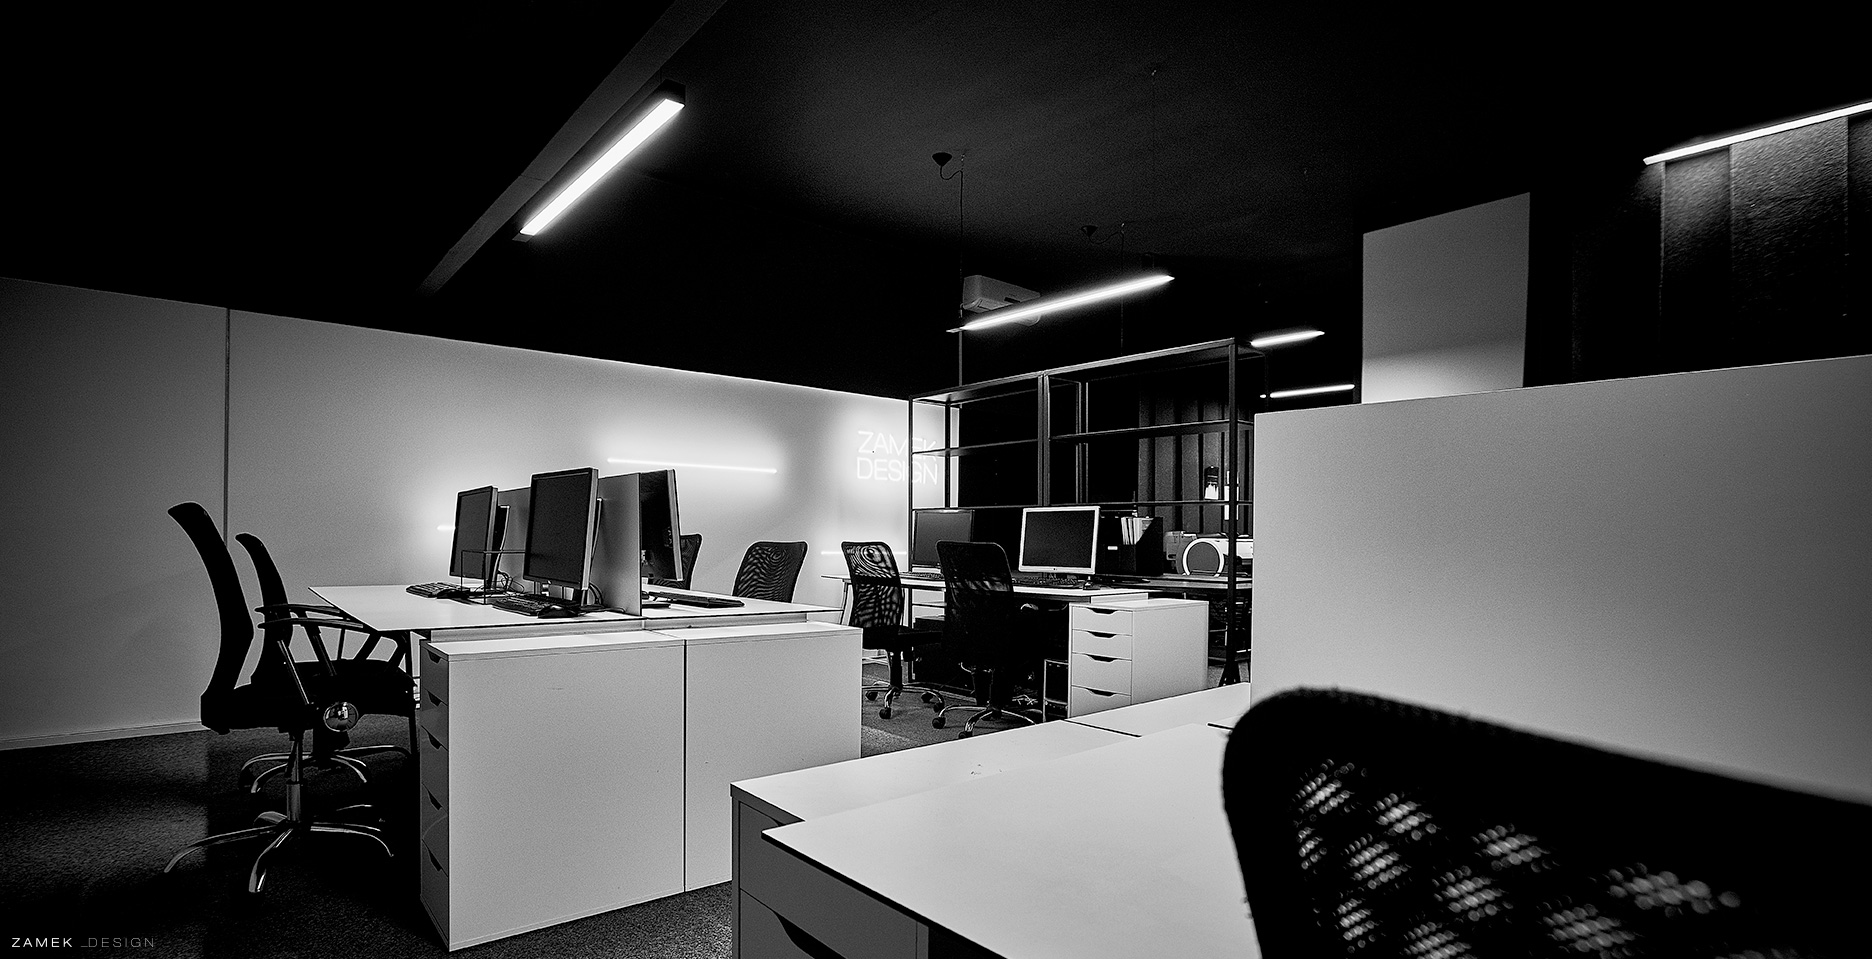 Zamek Design - Biuro